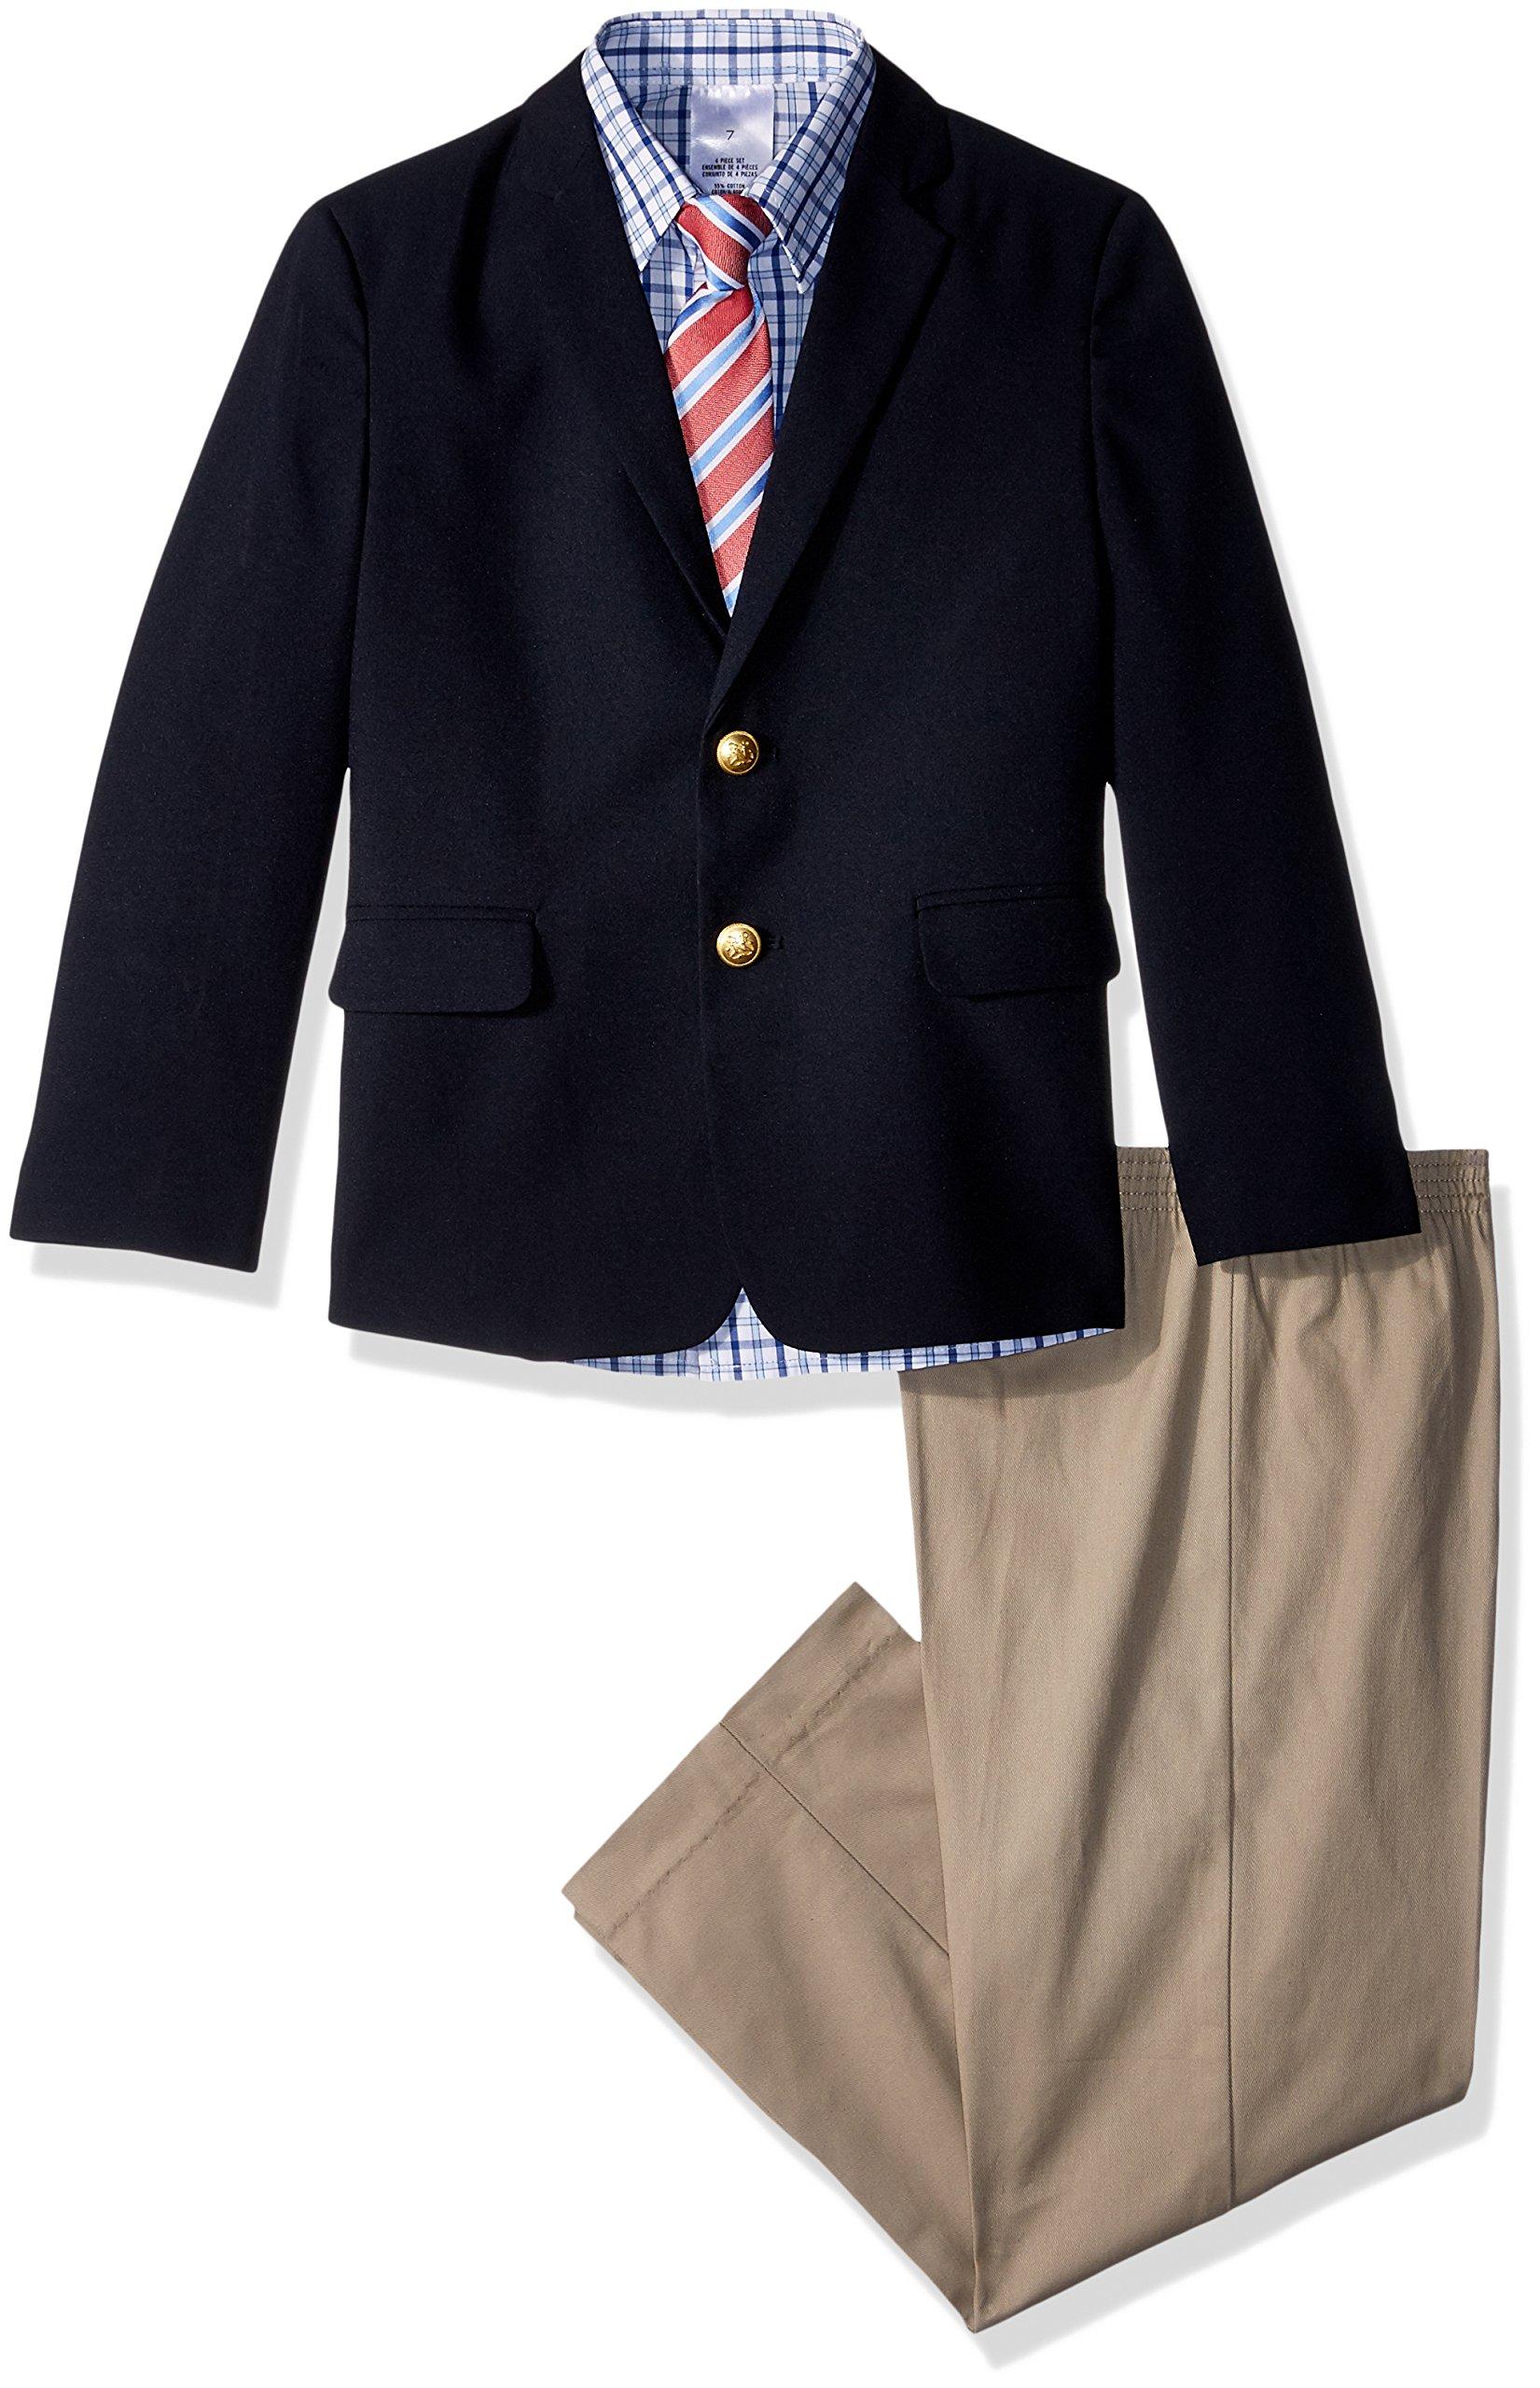 Nautica Boys' 4-Piece Suit Set with Dress Shirt, Tie, Jacket, and Pants, Dresswear Brass Navy, 10